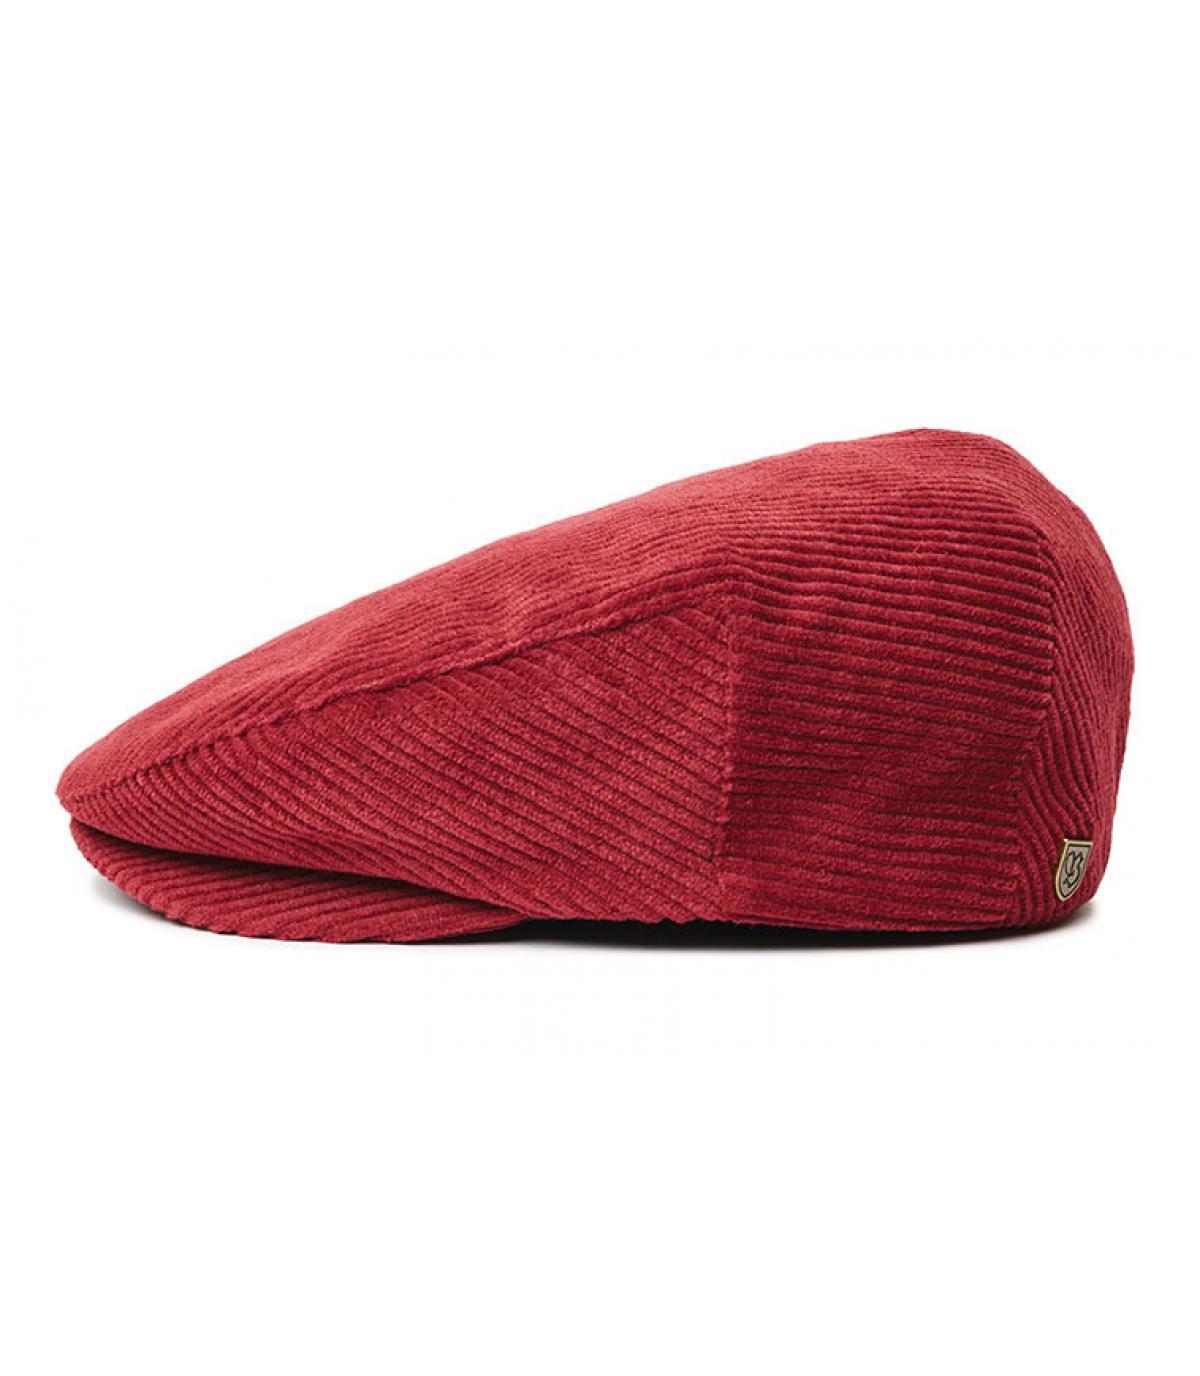 bordeaux fluweel baret